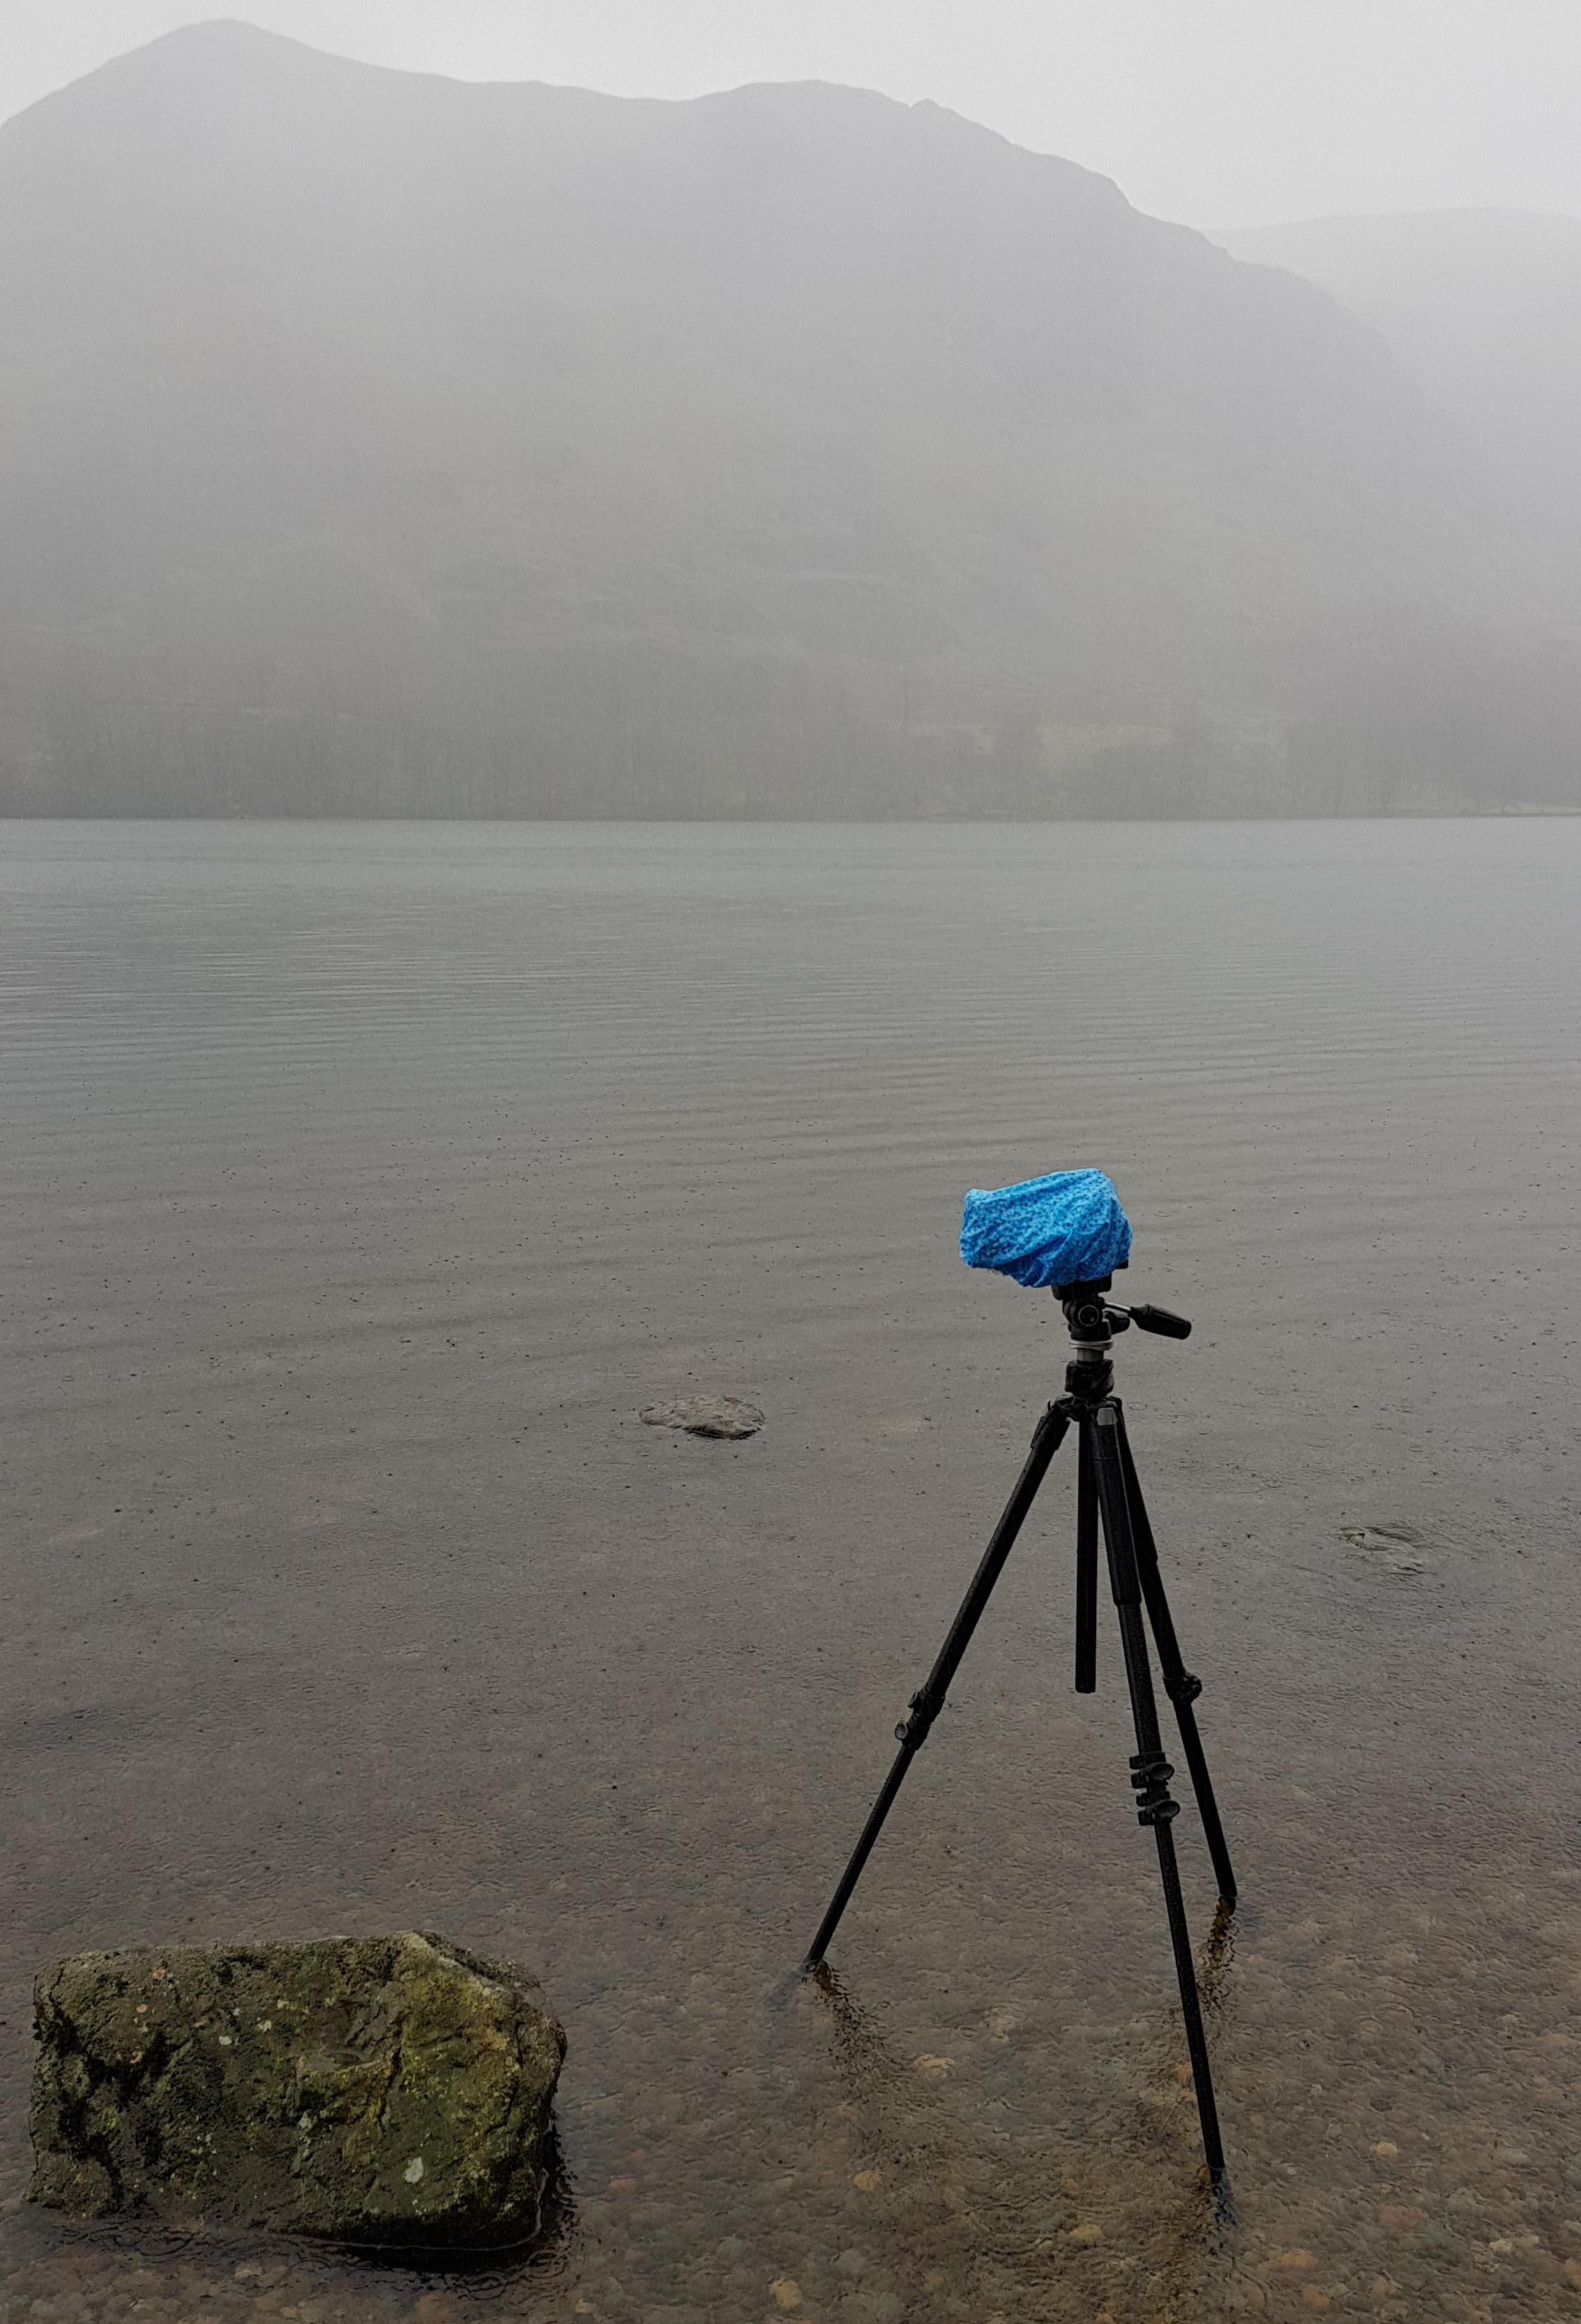 keeping_my_camera_dry_in_the_rain.jpg